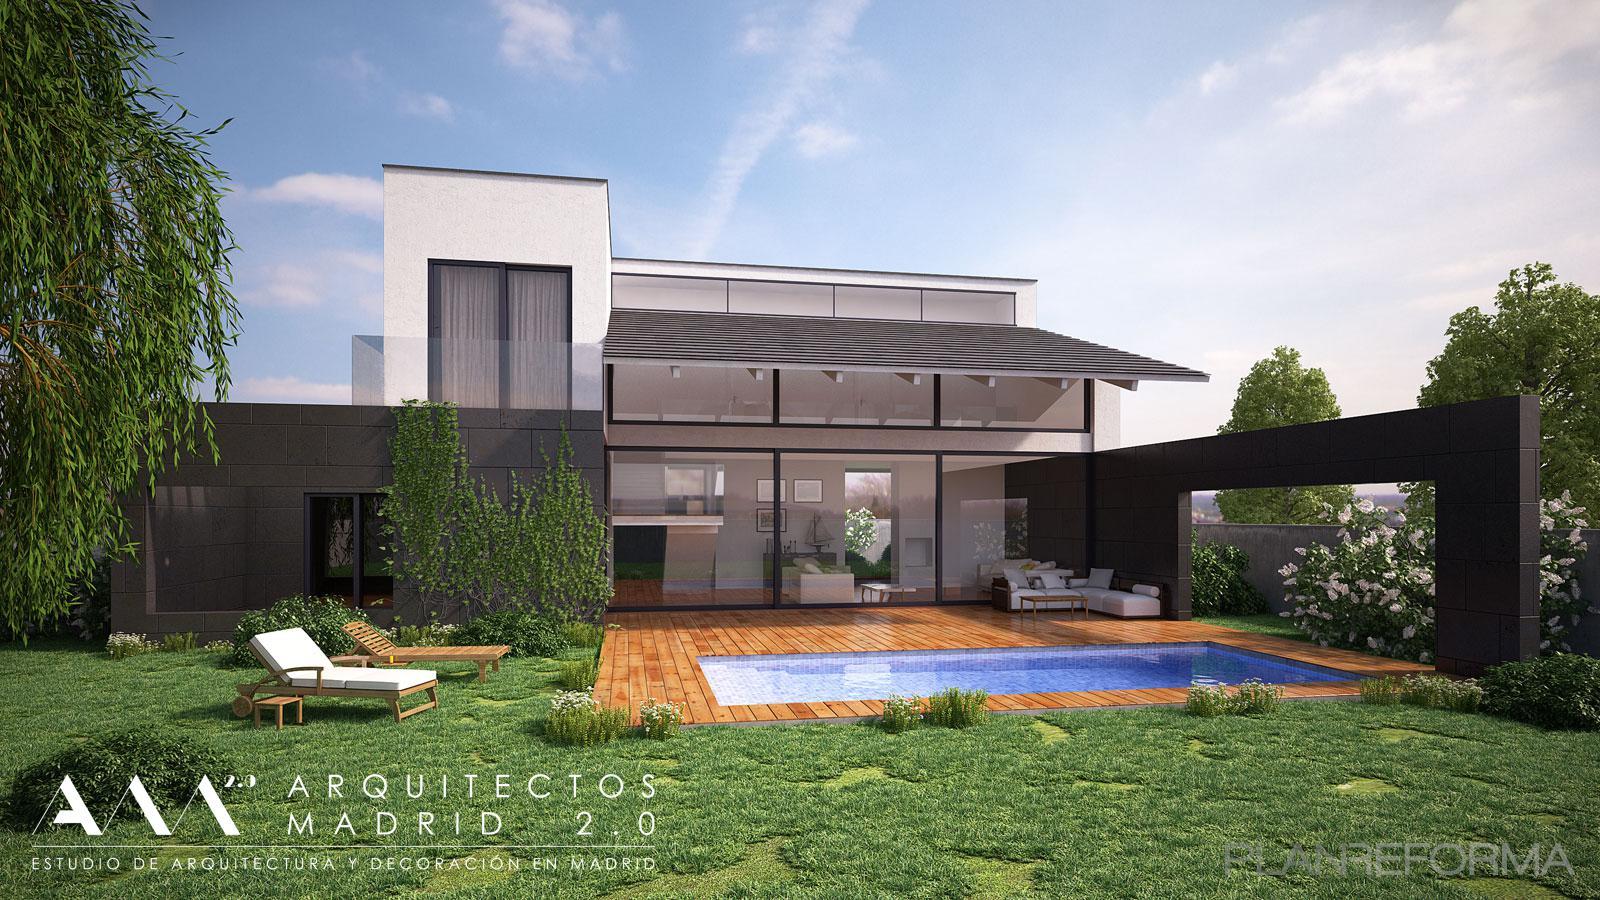 Piscina exterior jardin style moderno color marron - Proyectos de construccion de casas ...